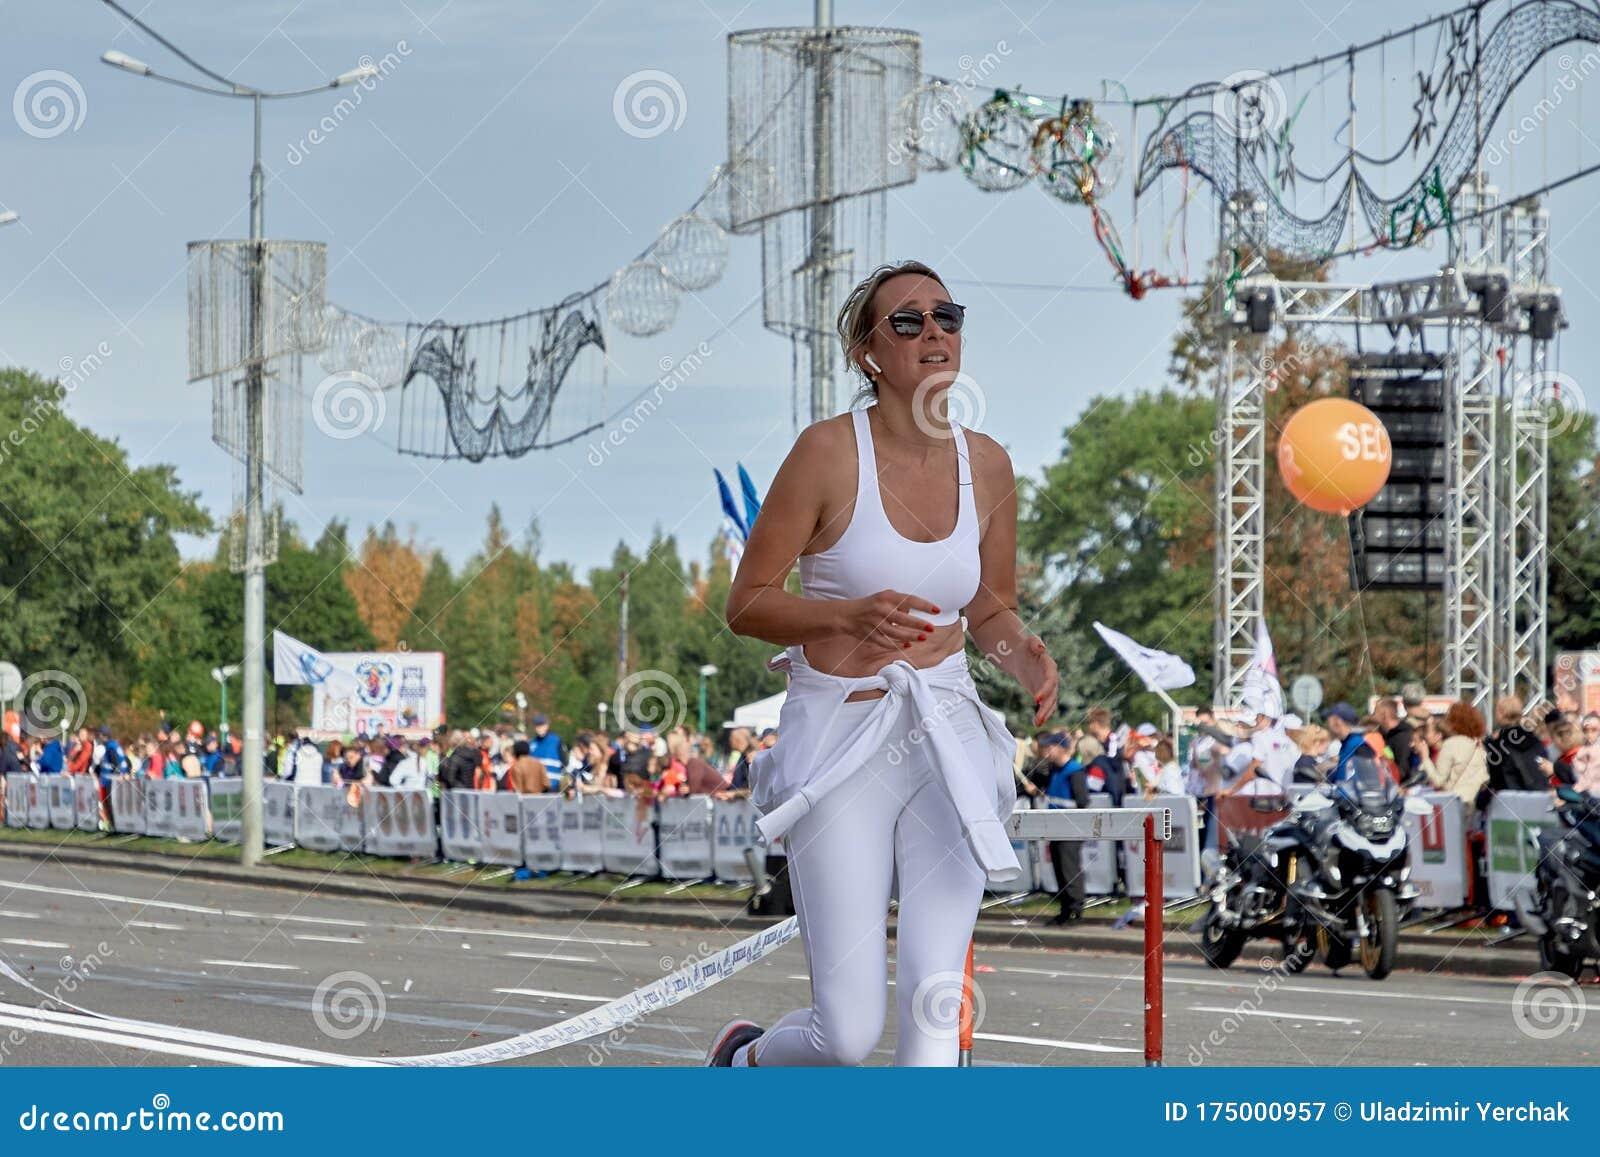 https://thumbs.dreamstime.com/z/september-minsk-belarus-beautiful-woman-white-suit-glasses-runs-marathon-city-road-half-marathon-minsk-running-175000957.jpg